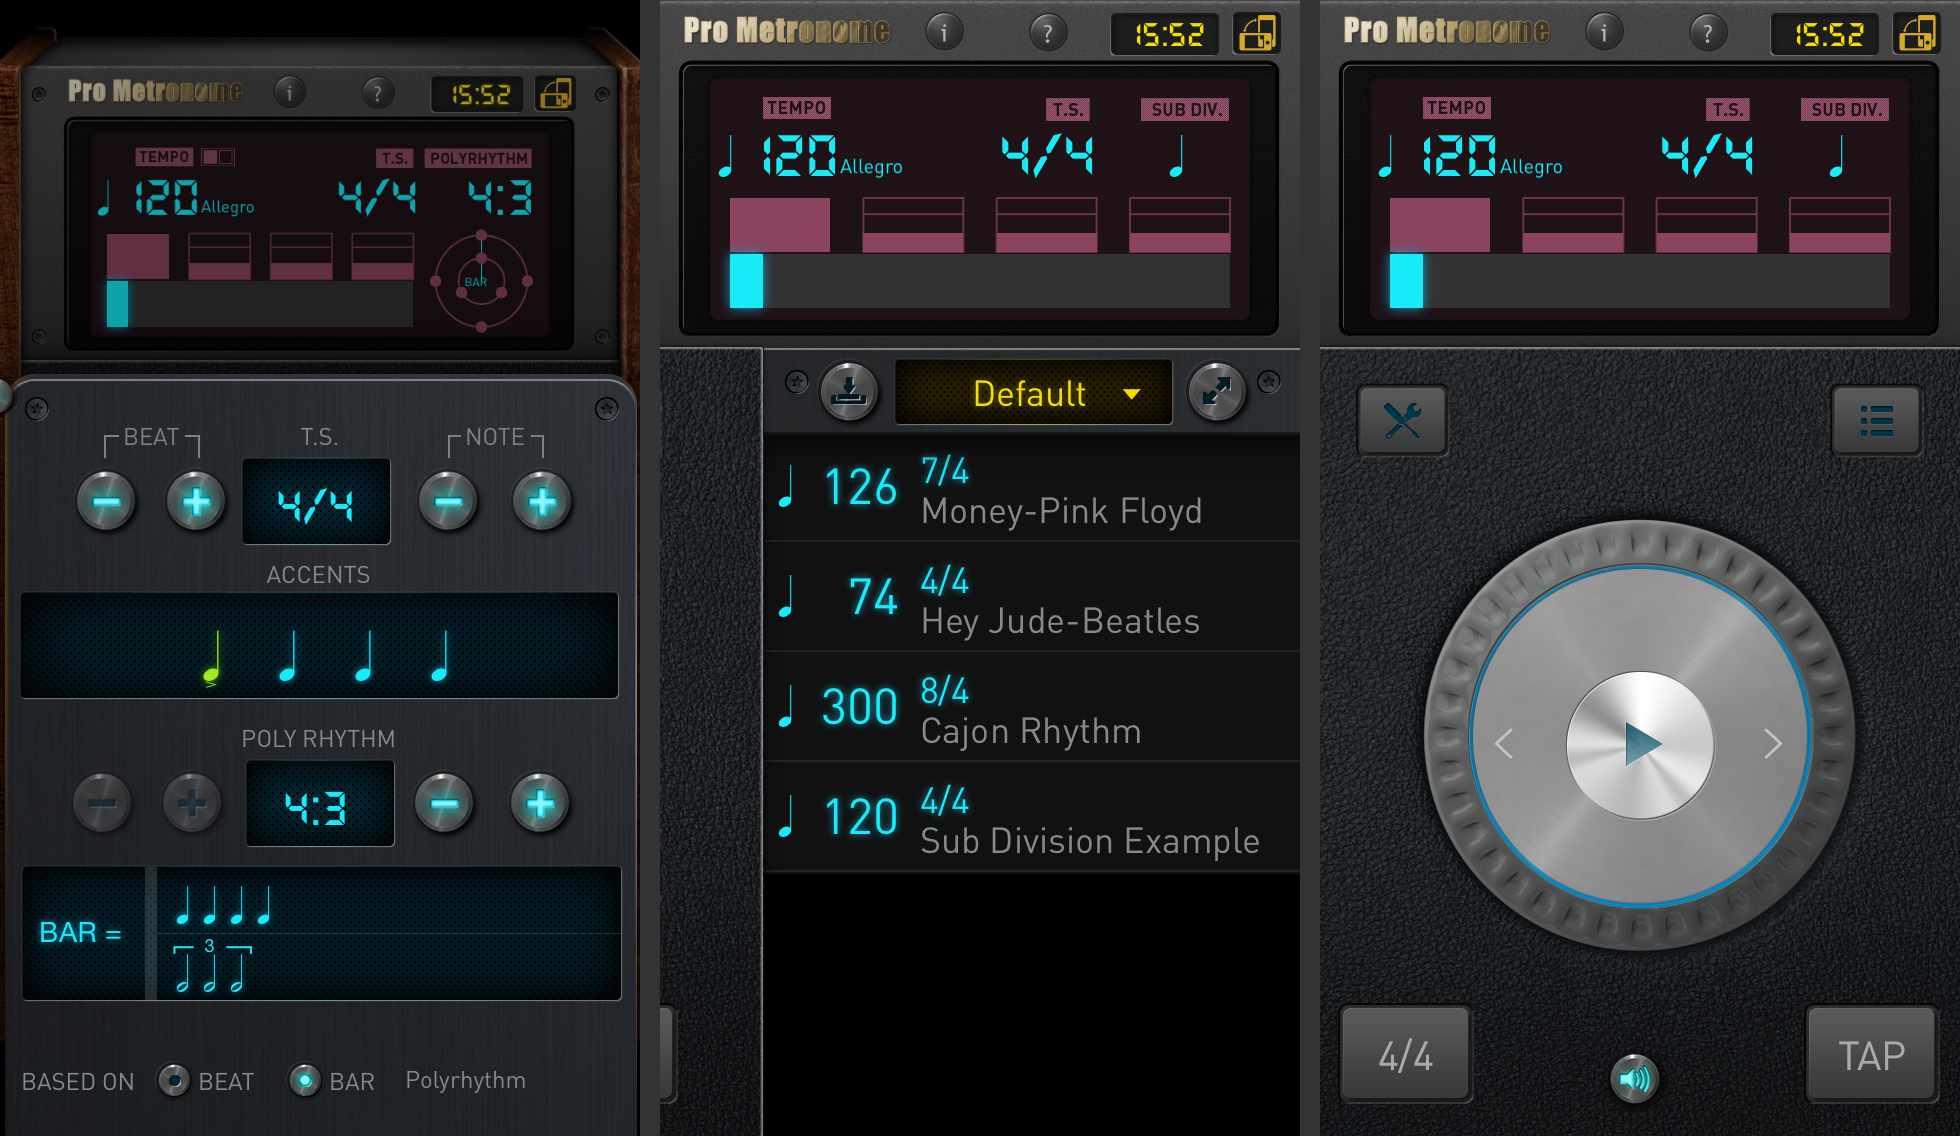 Three screenshots of the Pro Metronome app for iOS